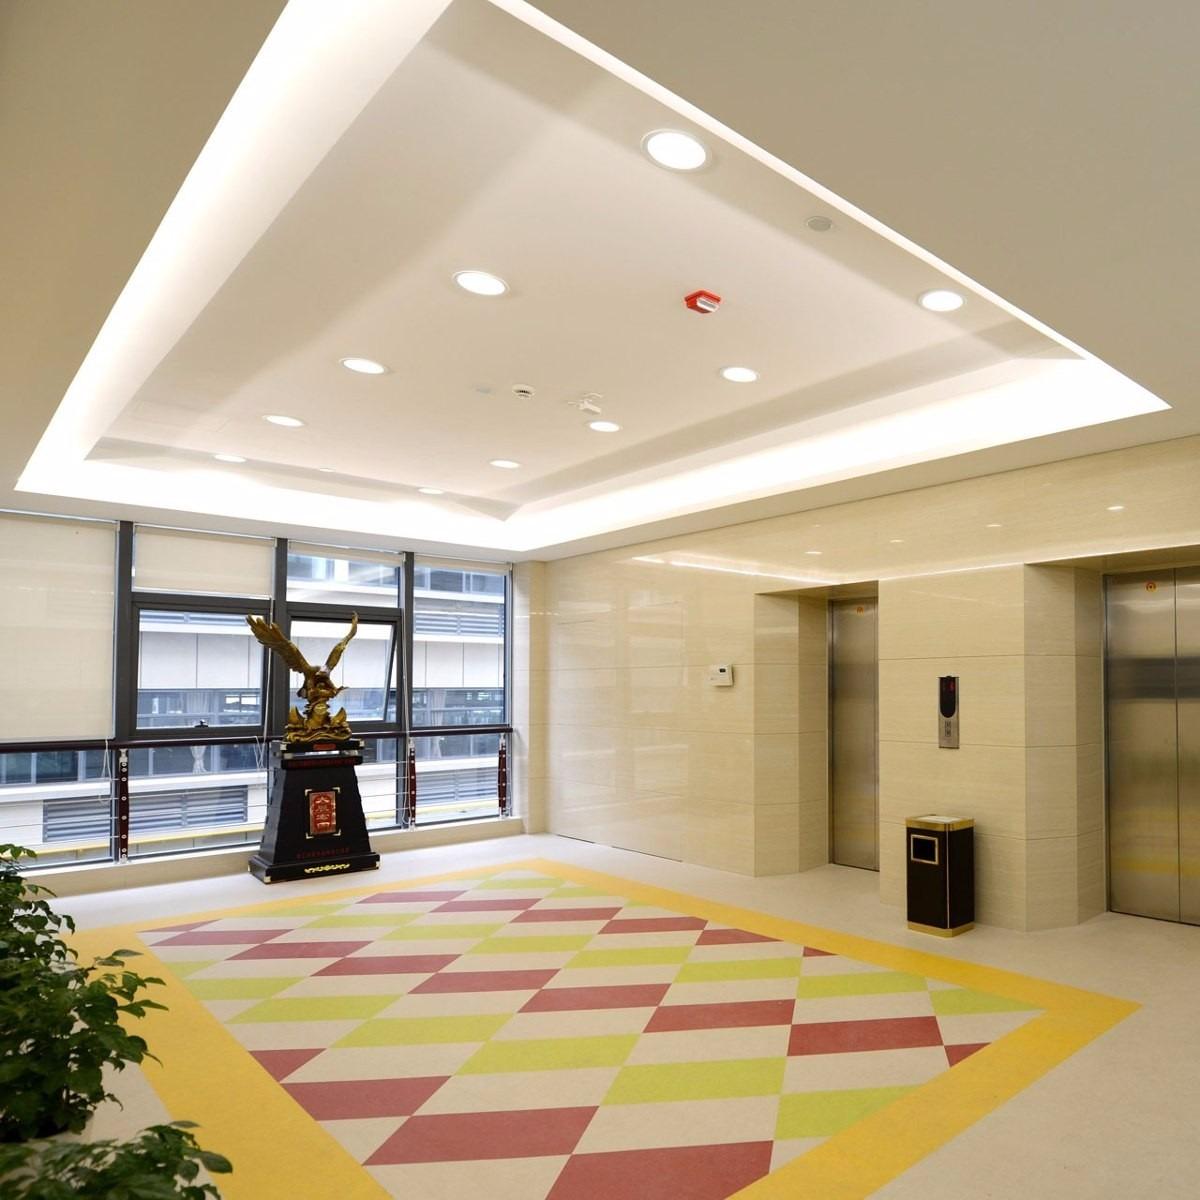 Panel led 3w luz empotrada de techo 290 00 en mercado - Luz de techo ...